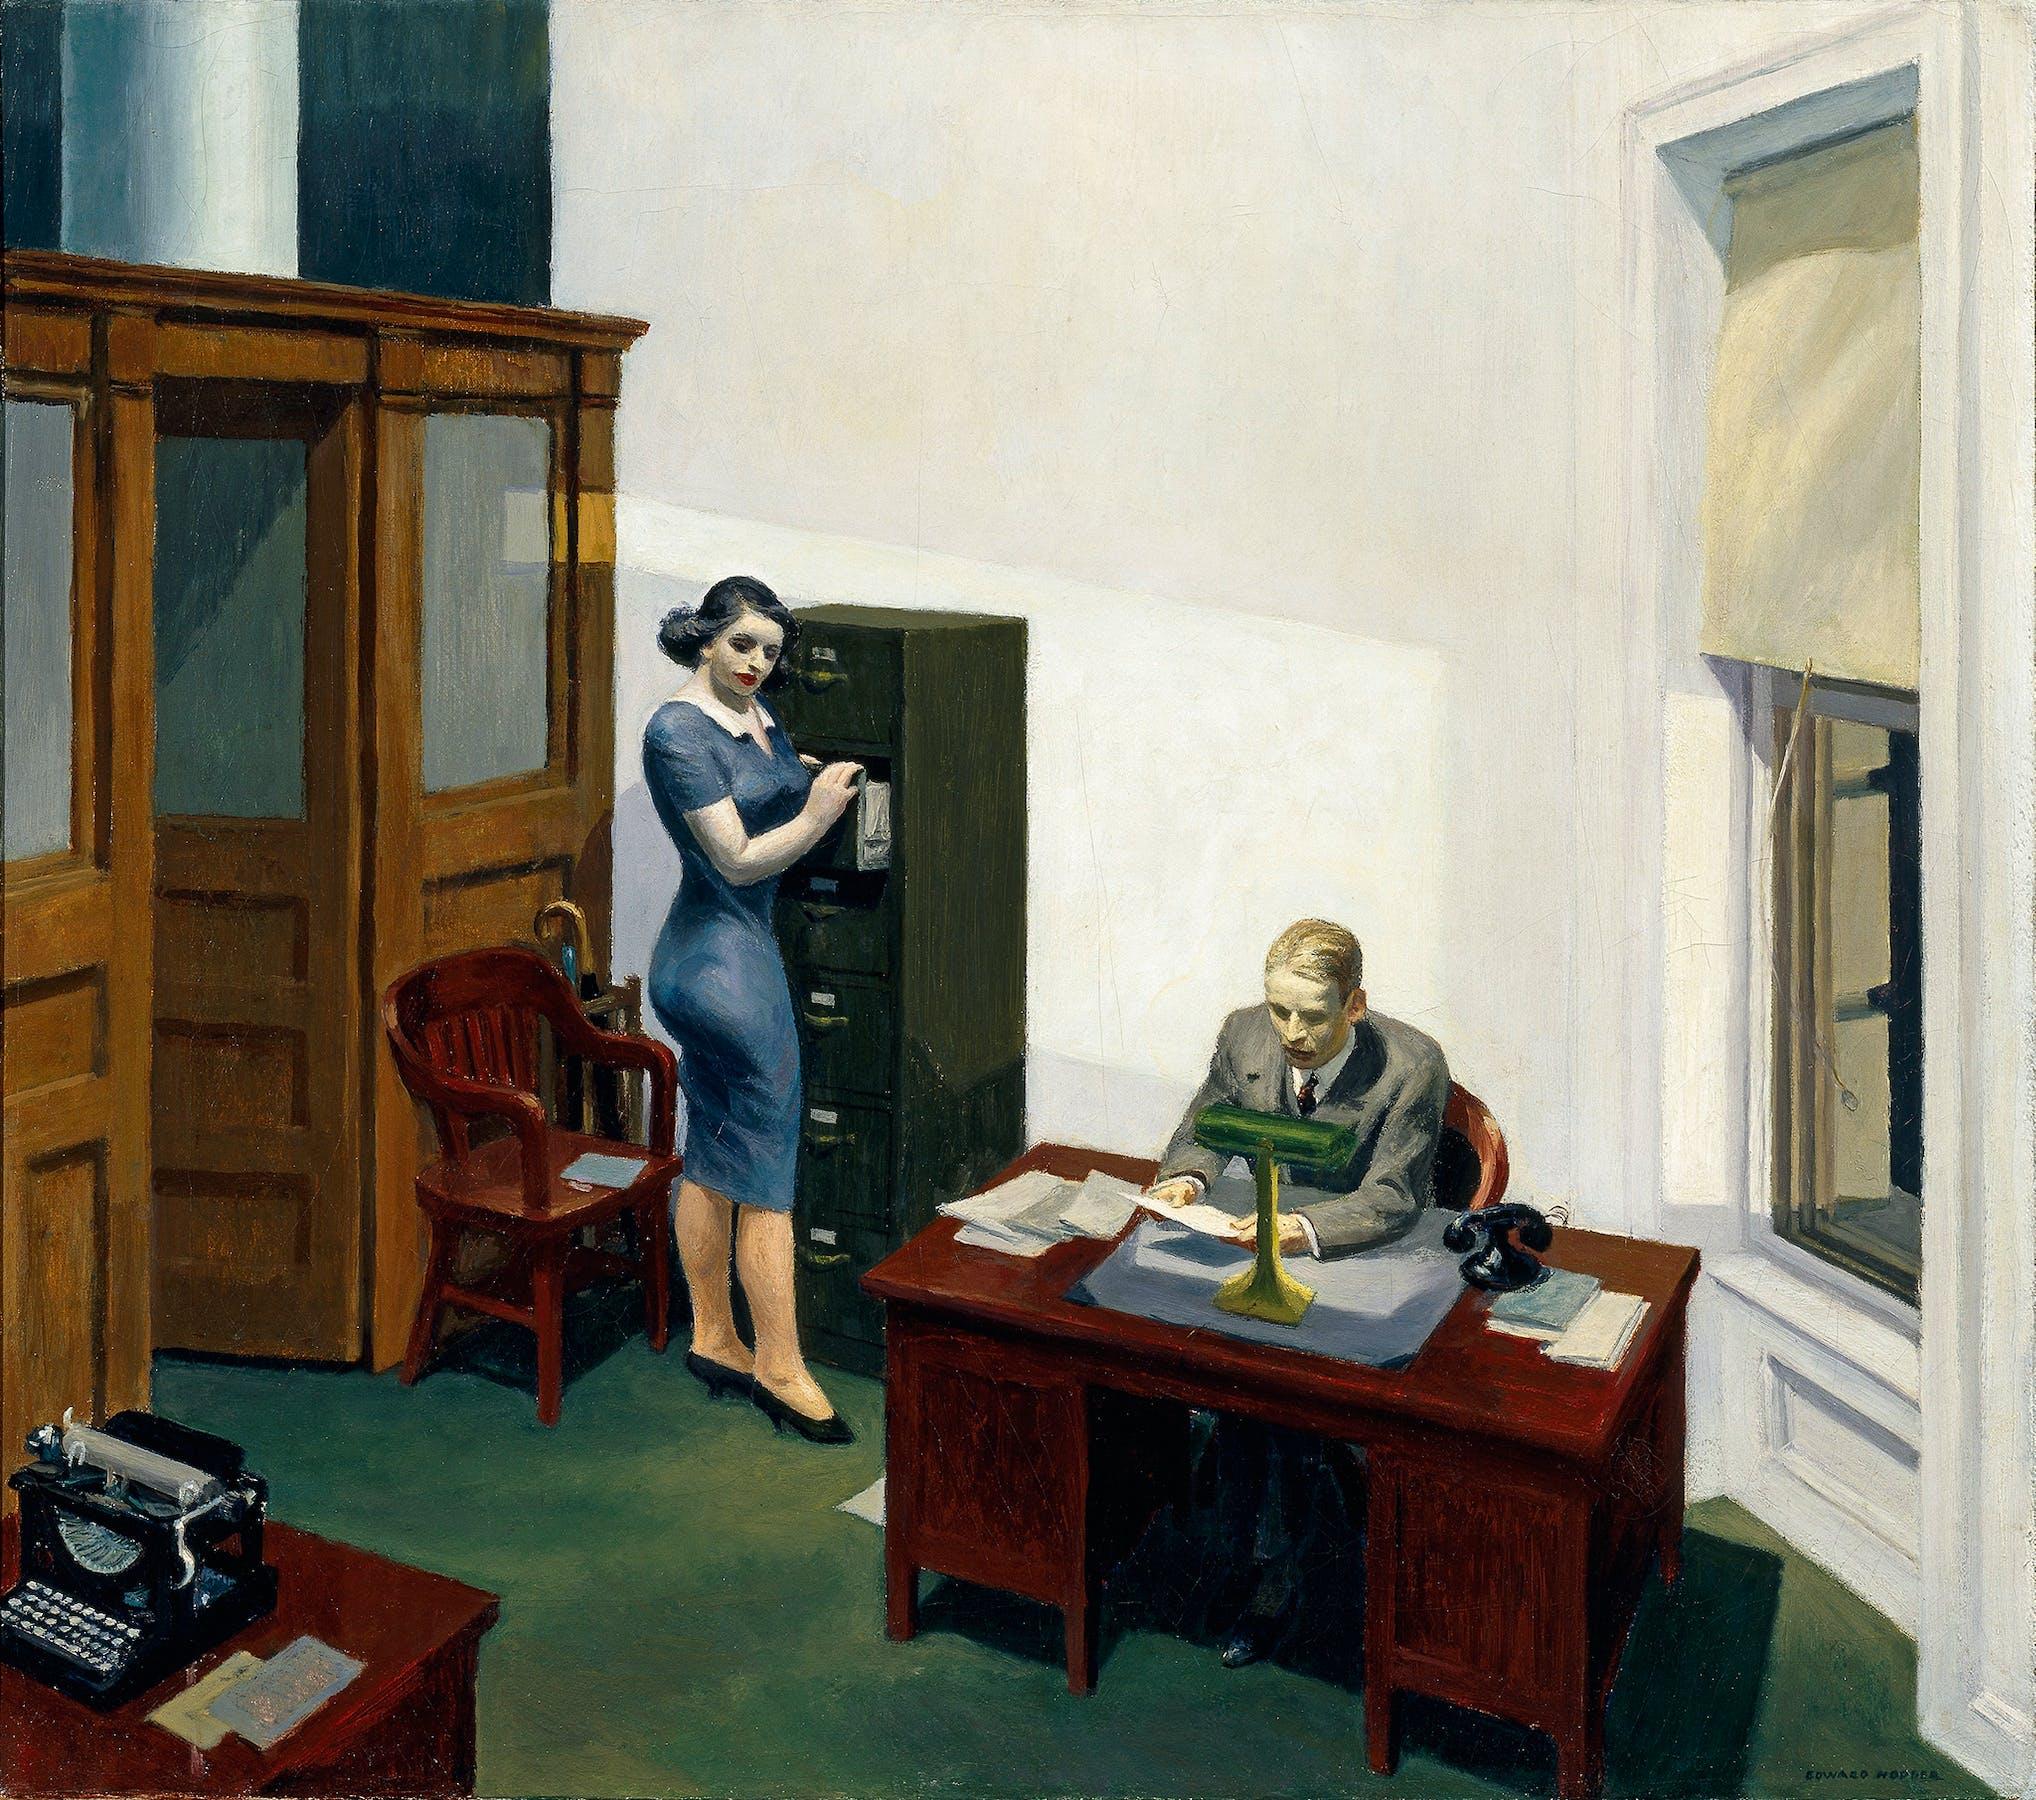 Edward Hopper Painting Hosts Writers Residency